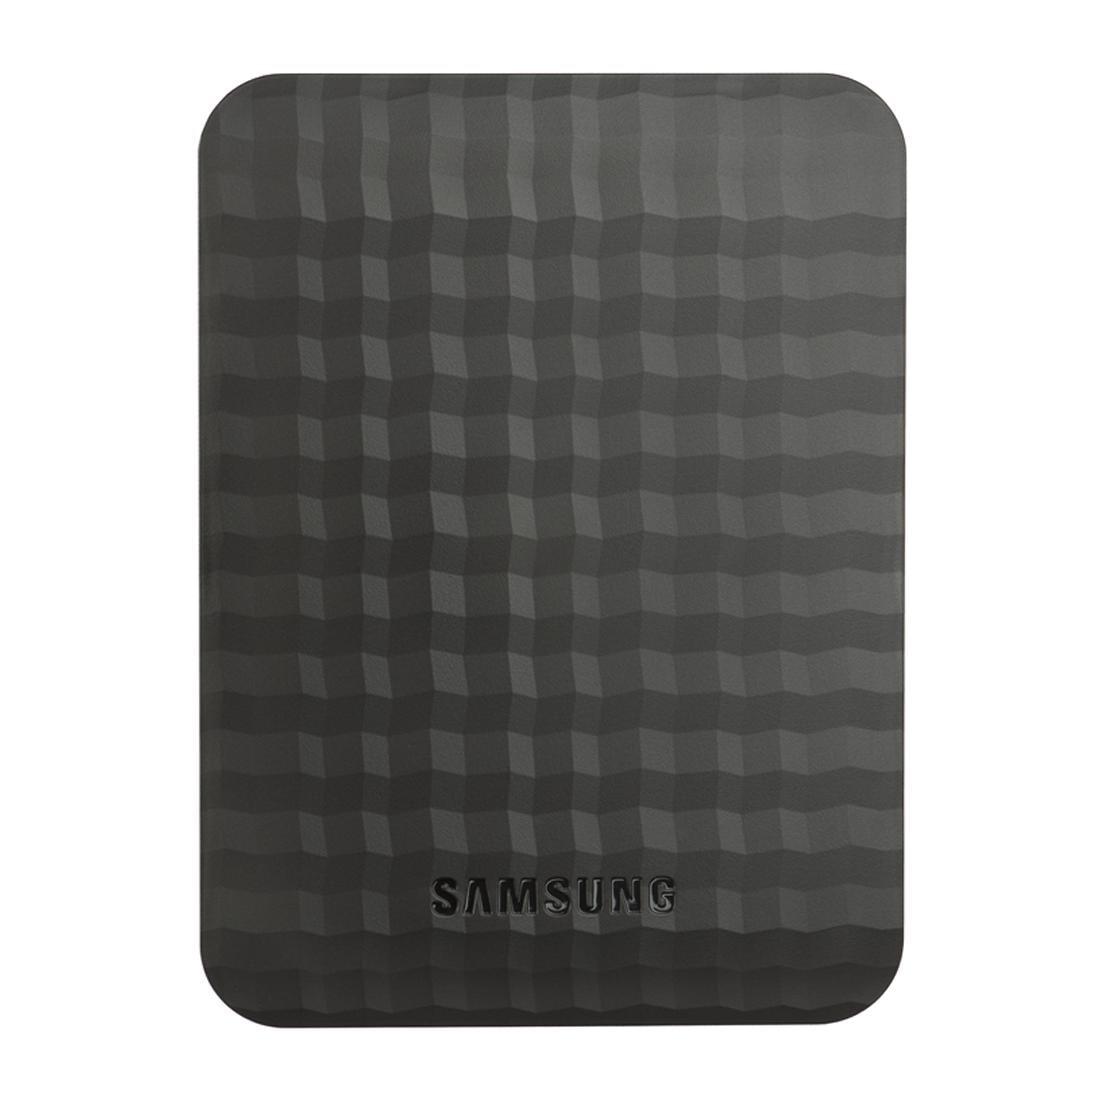 https://assetscdn1.paytm.com/images/catalog/product/S/Sa/Samsung_M3_2TB_Black_20915/a_3.jpg